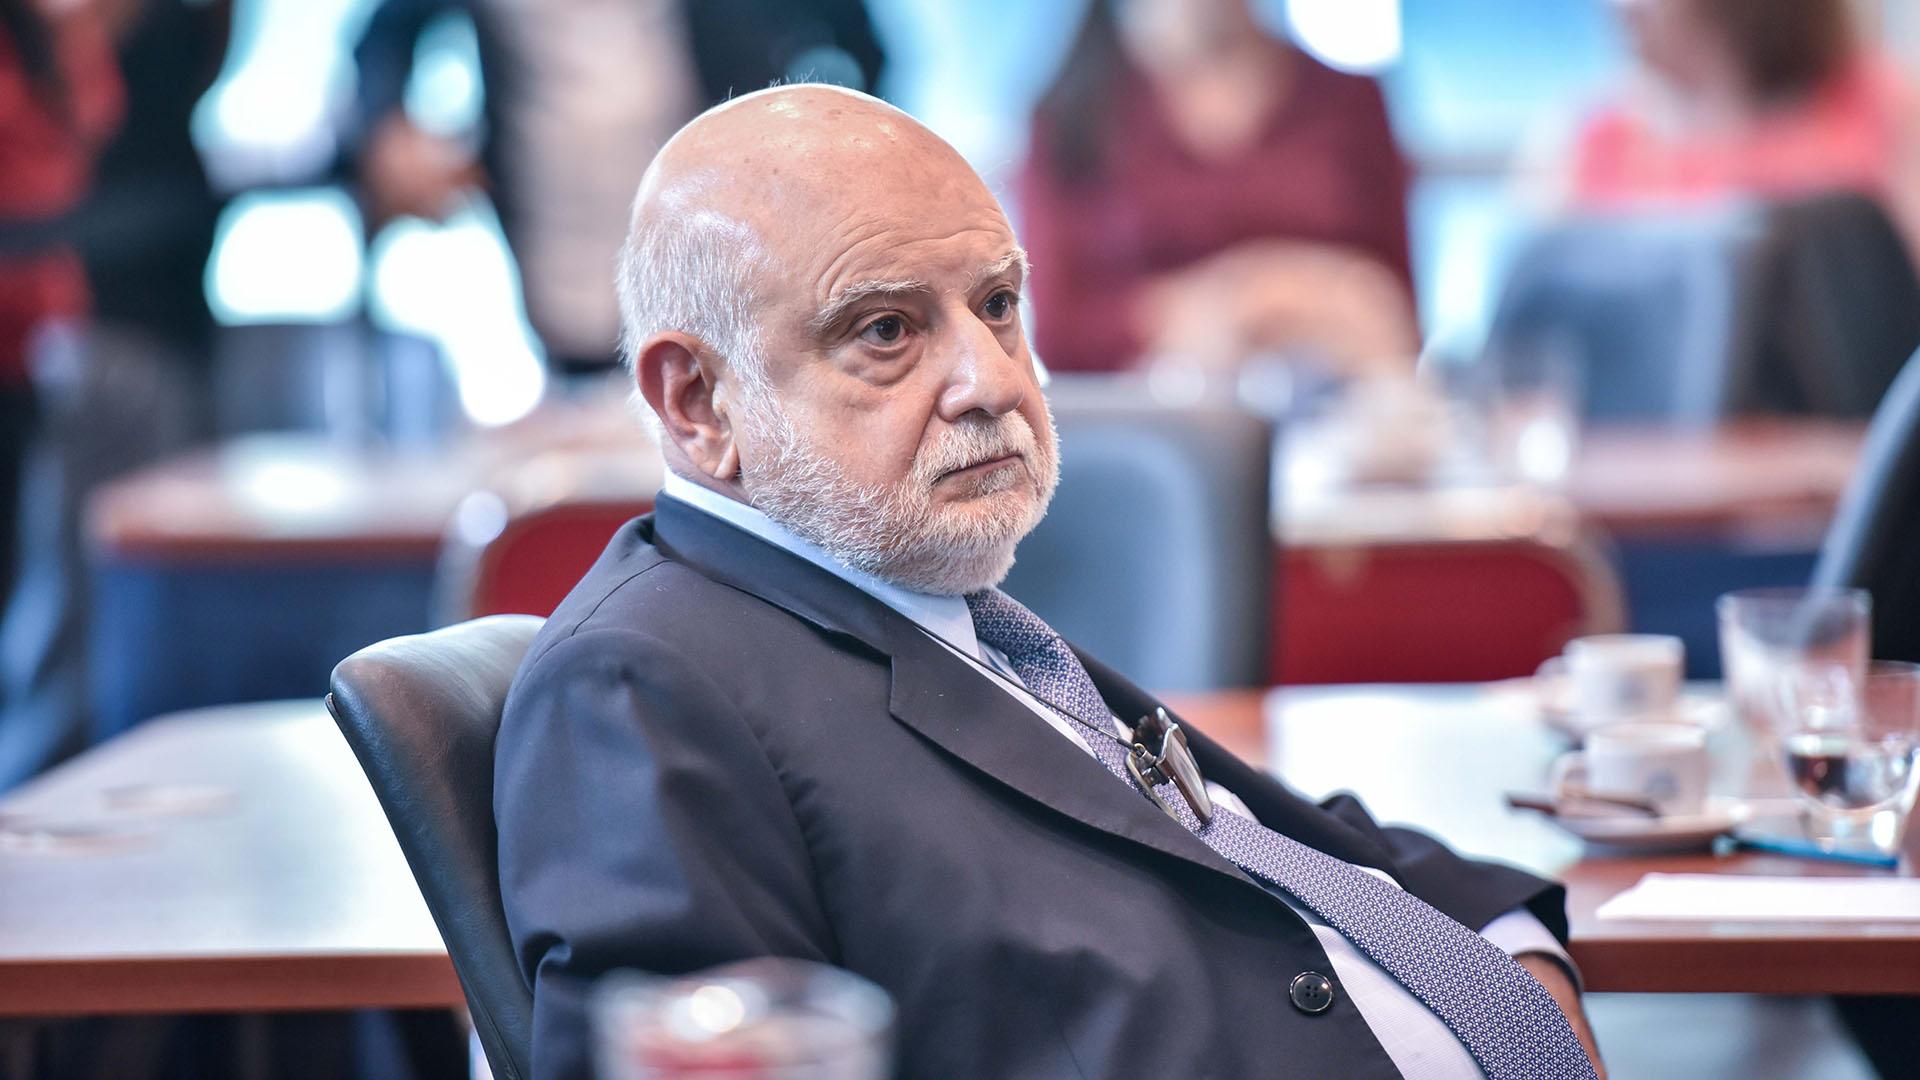 Rodolfo Barra